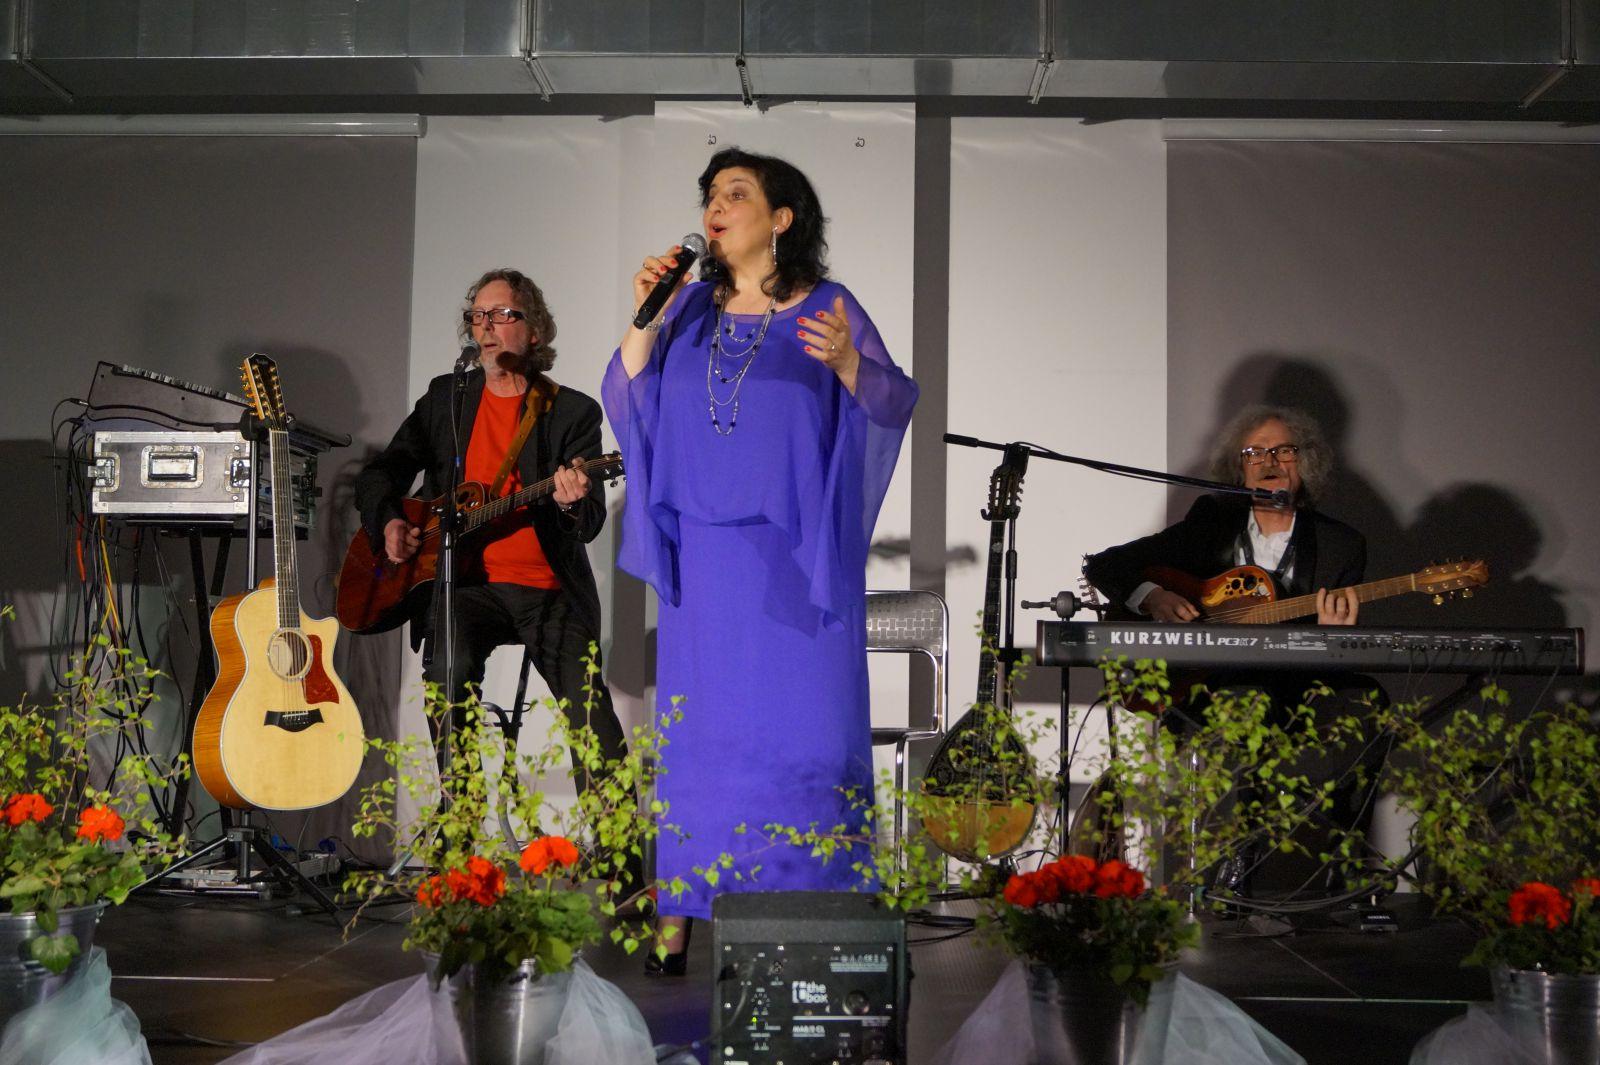 Koncert Eleni w Centrum Witold